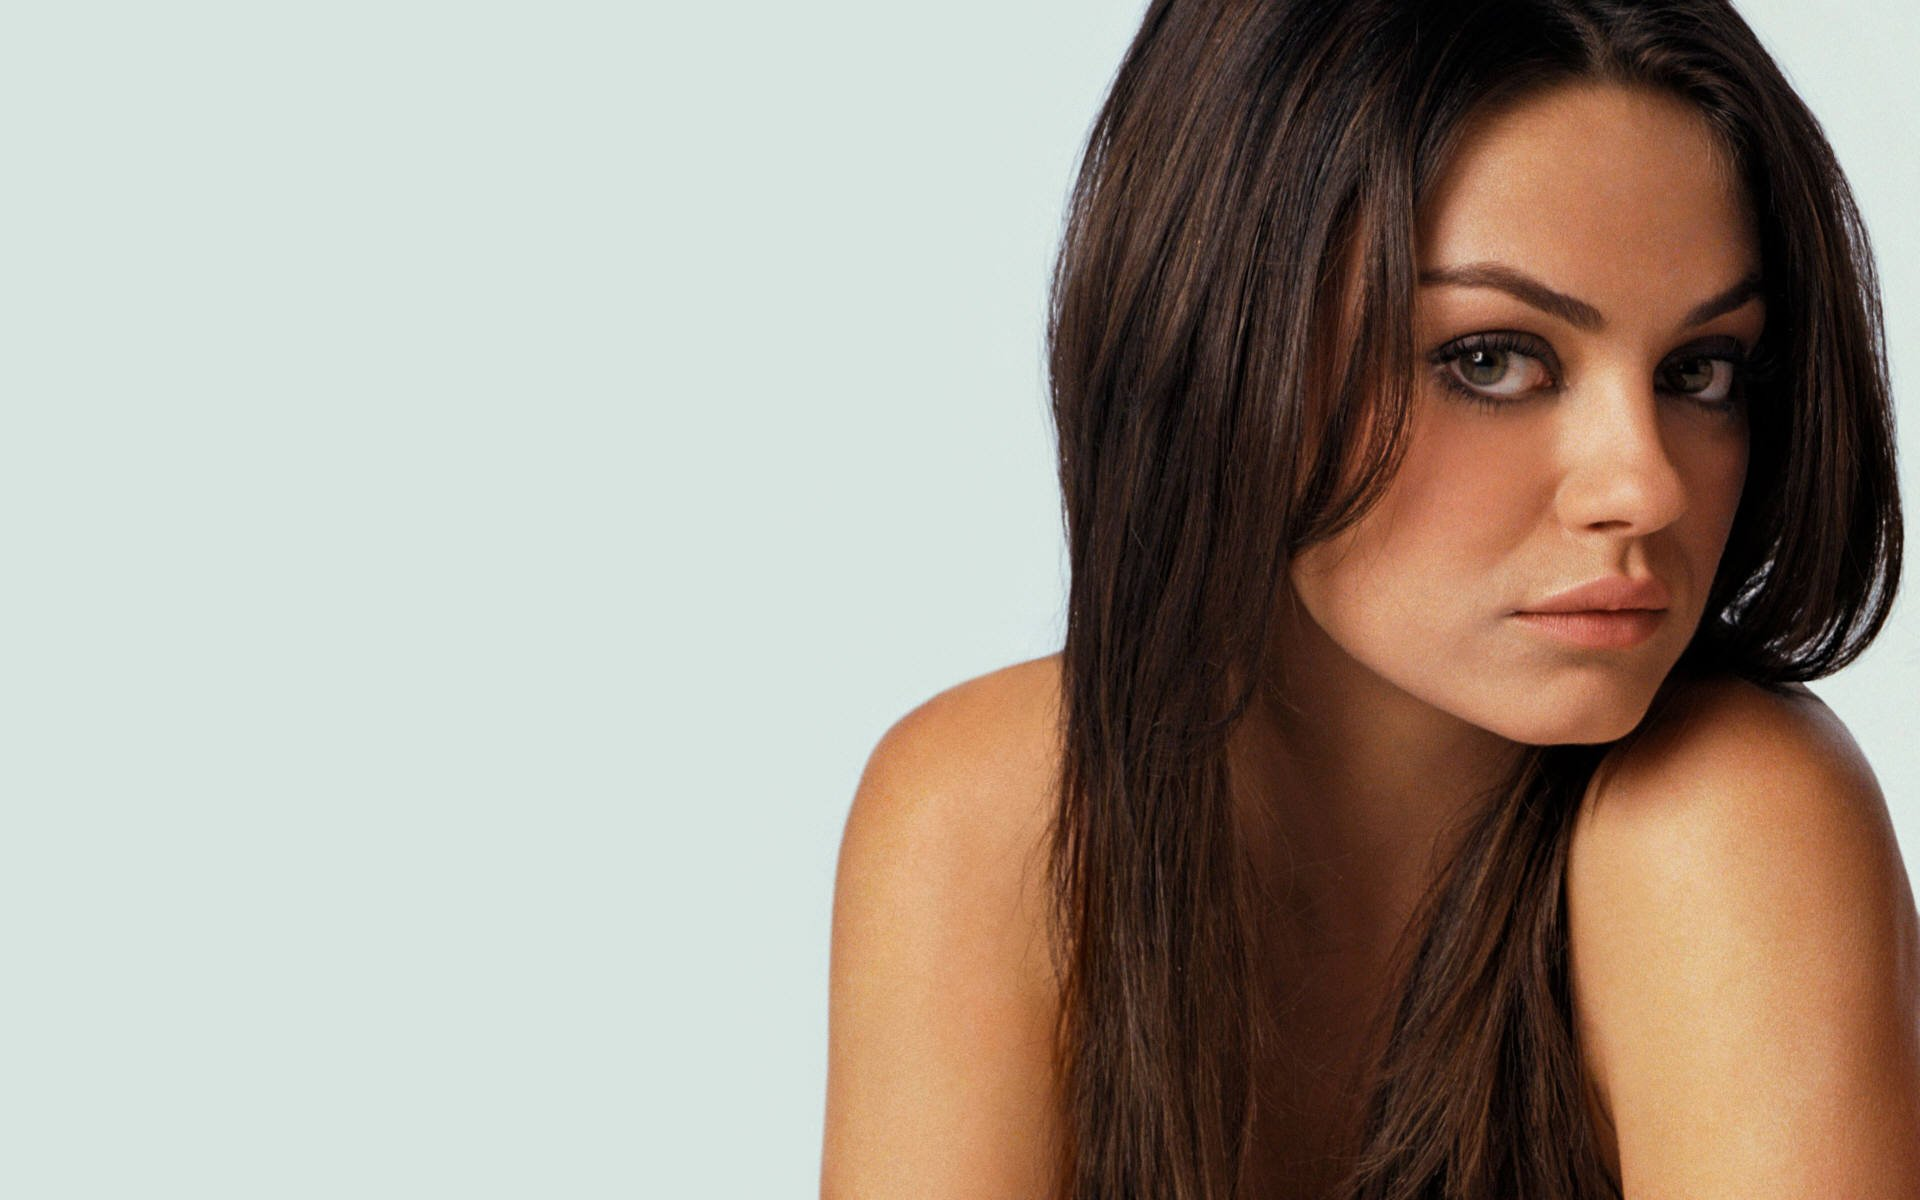 Happy Bday, Mila Kunis!